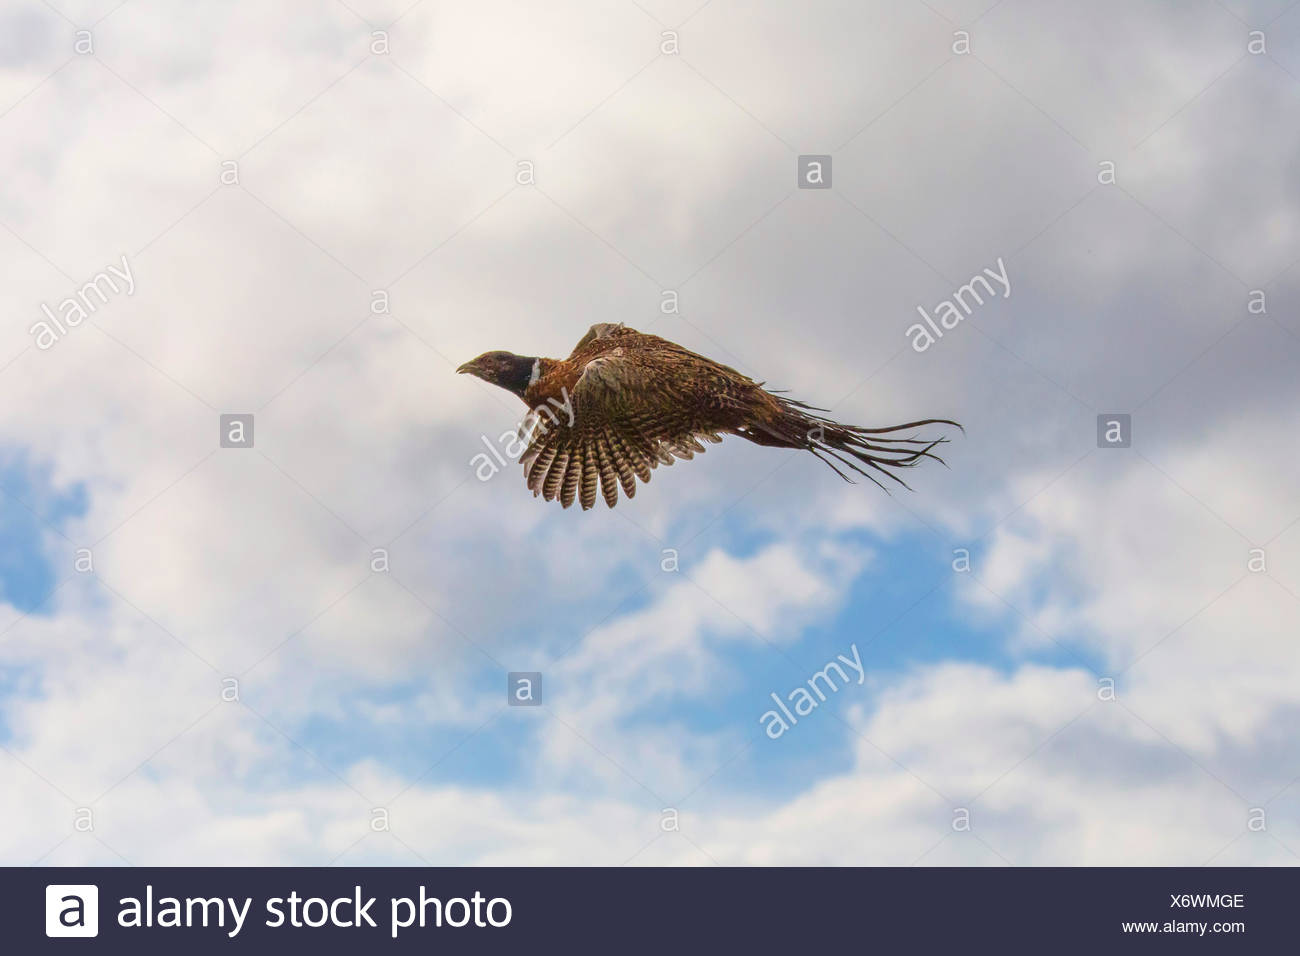 Faisán común, el Cáucaso faisán faisán (Phasianus colchicus caucásica), volando en el cielo, Alemania, Baviera, Niederbayern, Baja Baviera Imagen De Stock